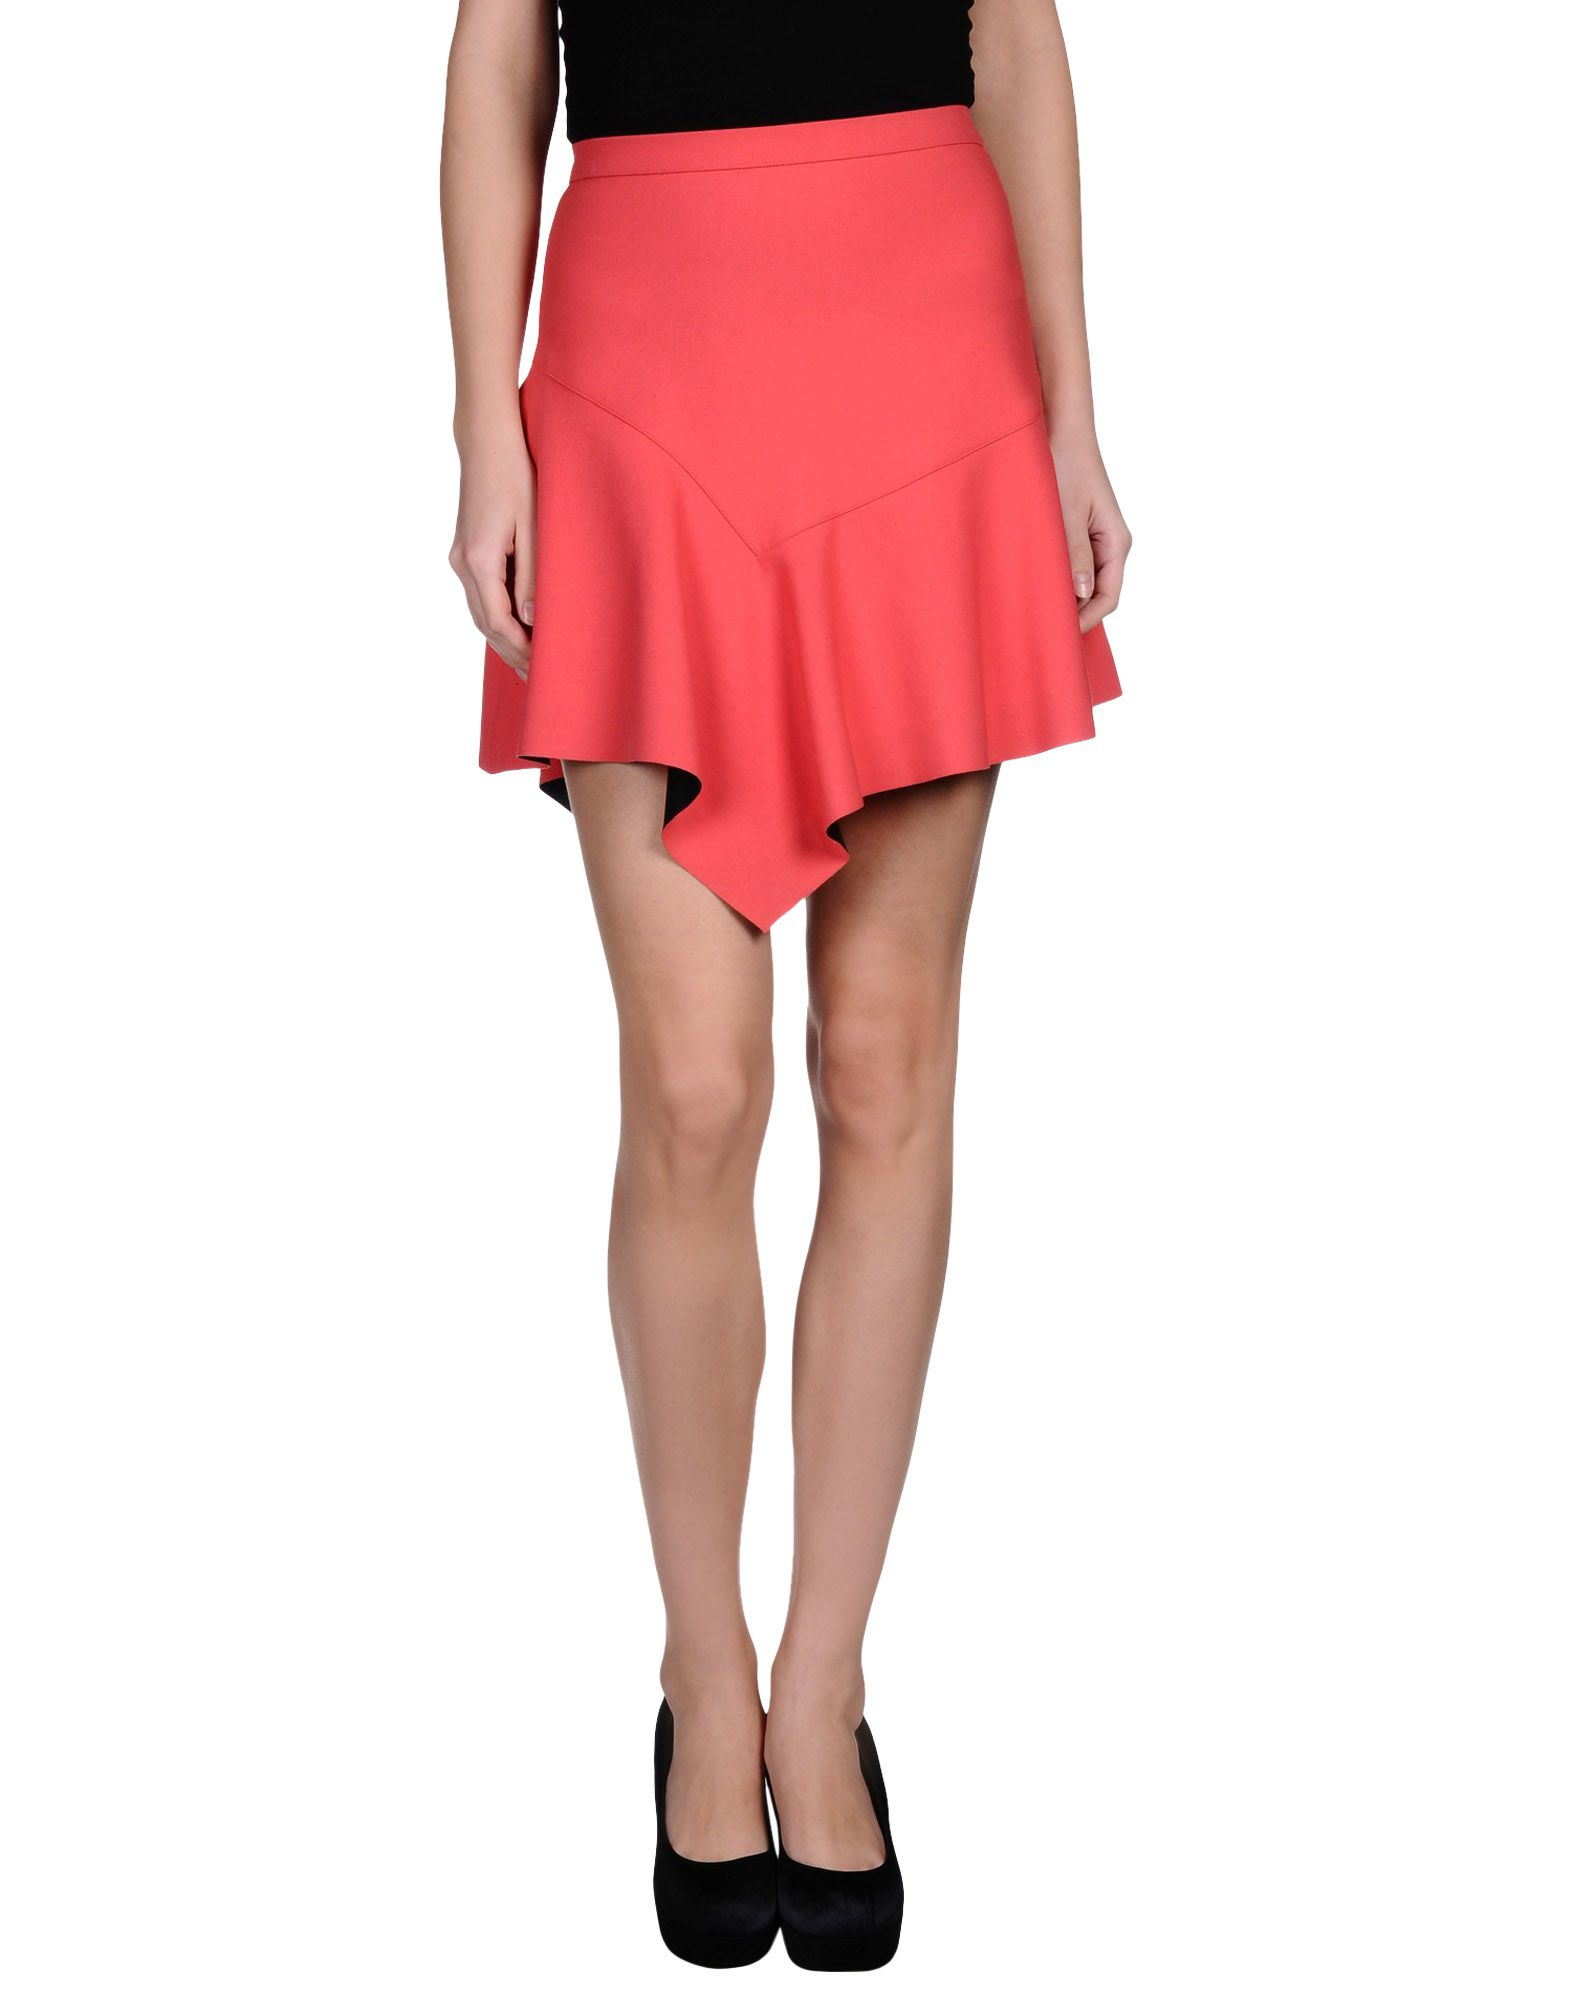 Elegant Red Lace Halter Chemise - Women